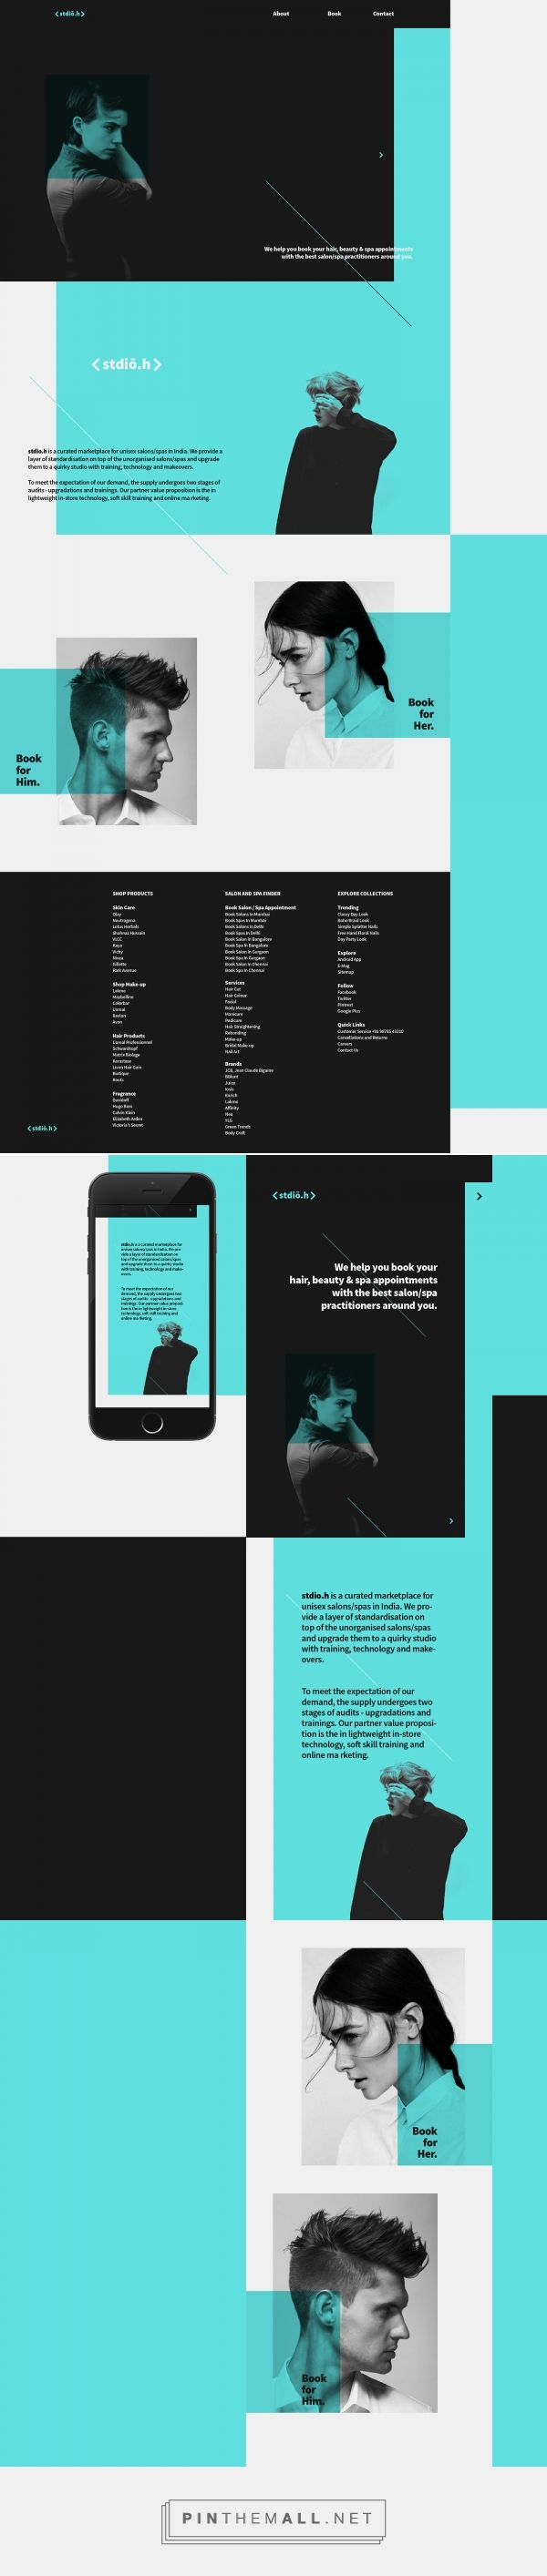 Stdio.h Salon Web Design by Utkarsh Raut | Fivestar Branding Agency – Design and Branding Agency & Curated Inspiration Gallery